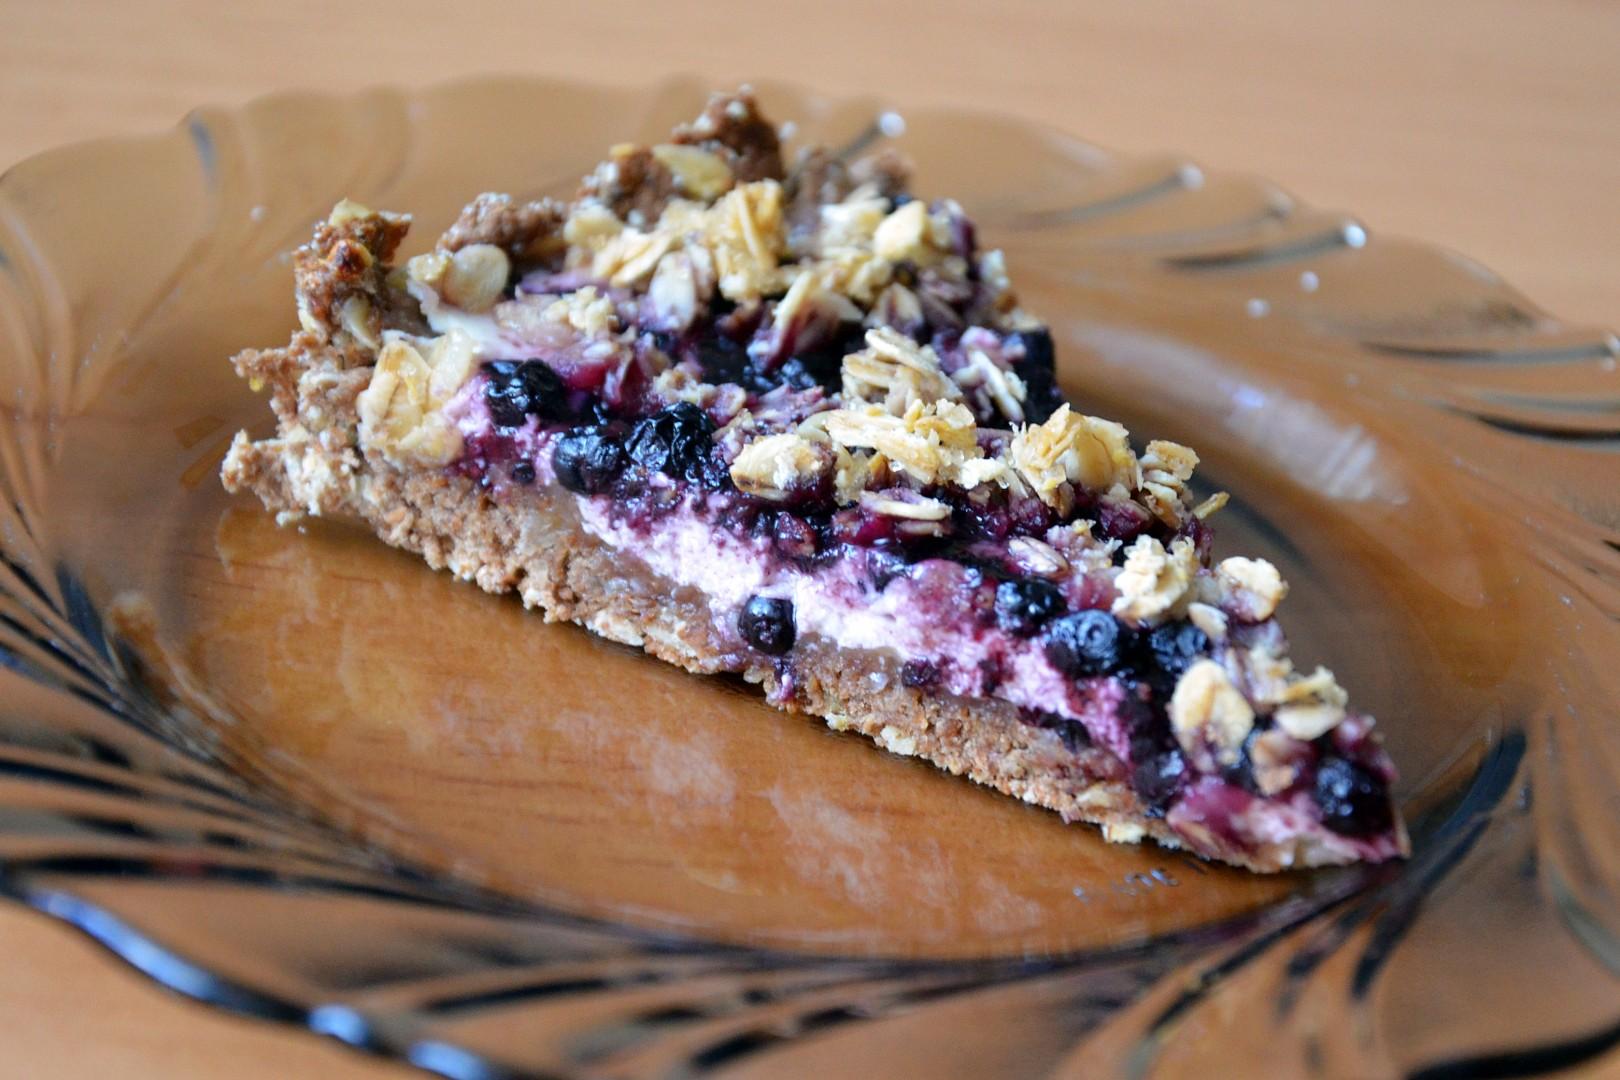 Celozrnný koláč s tvarohem, ovocem a drobenkou z ovesných vloček